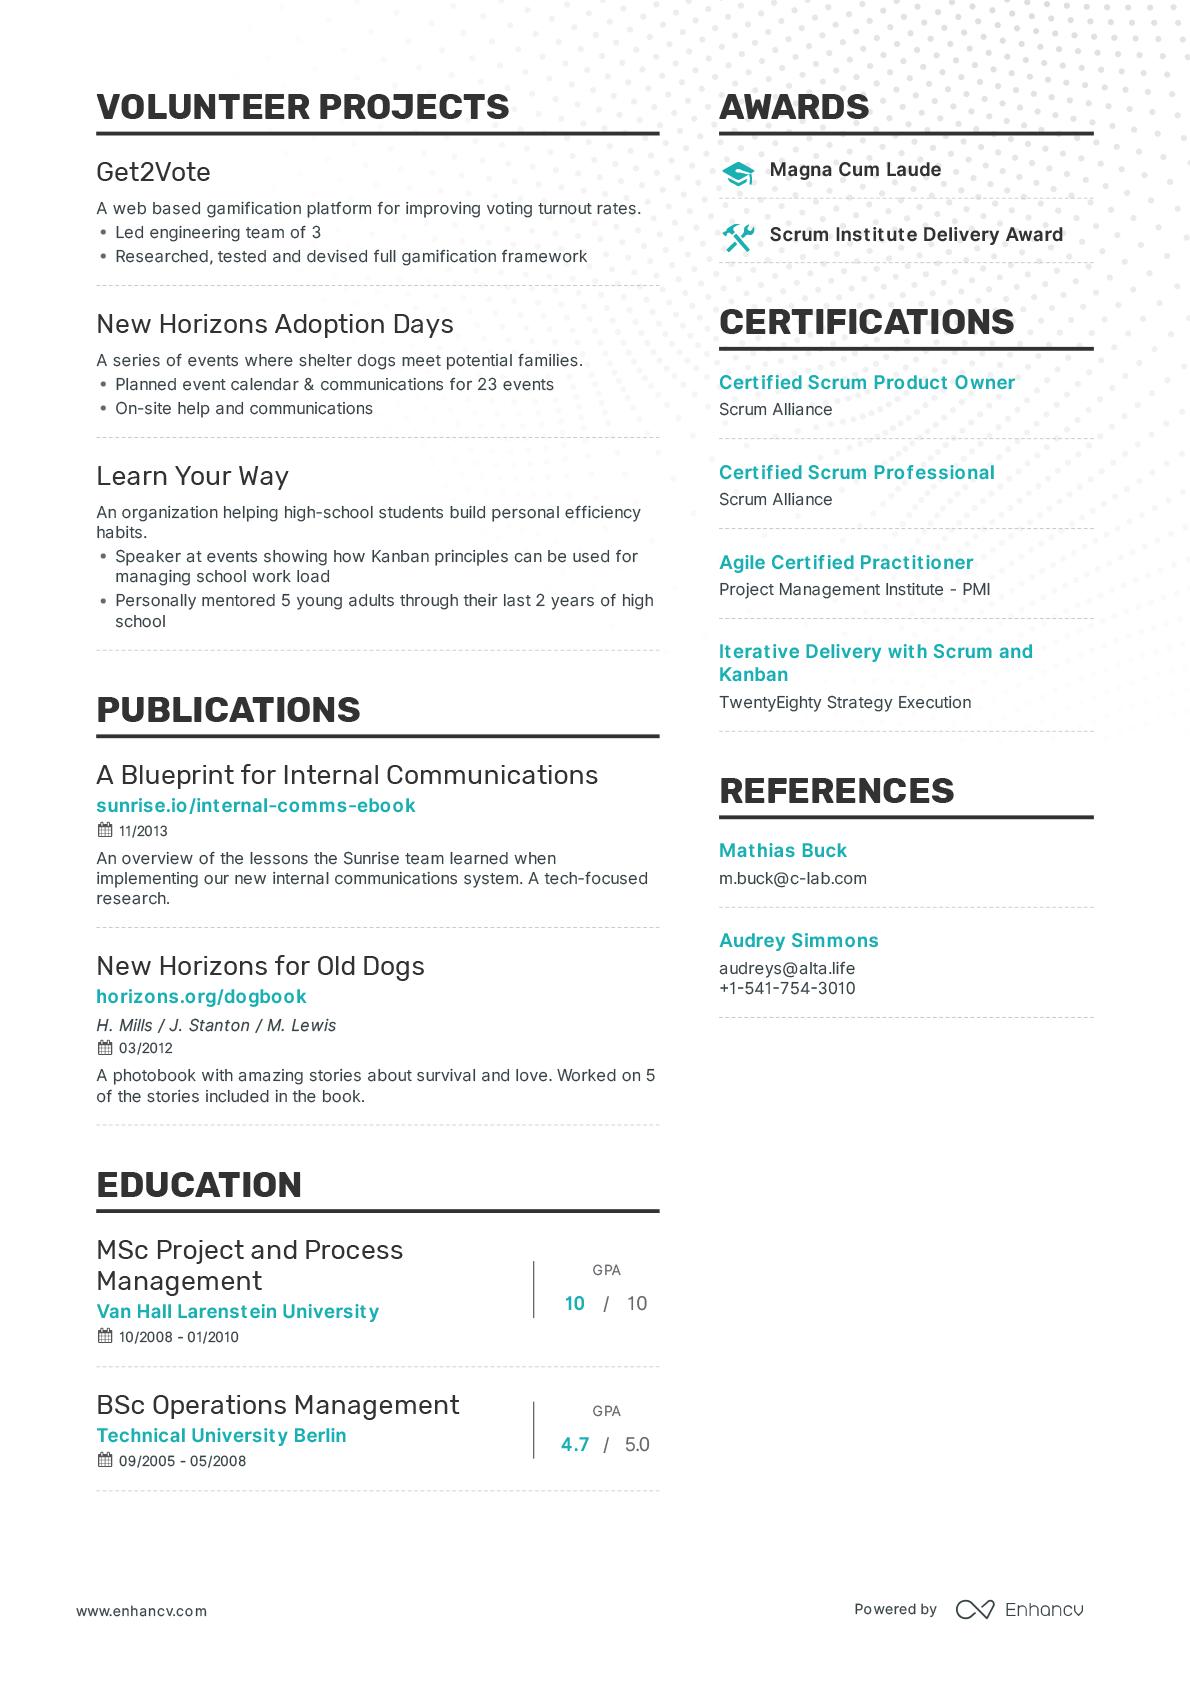 Enhancv resume builder - Resume samples